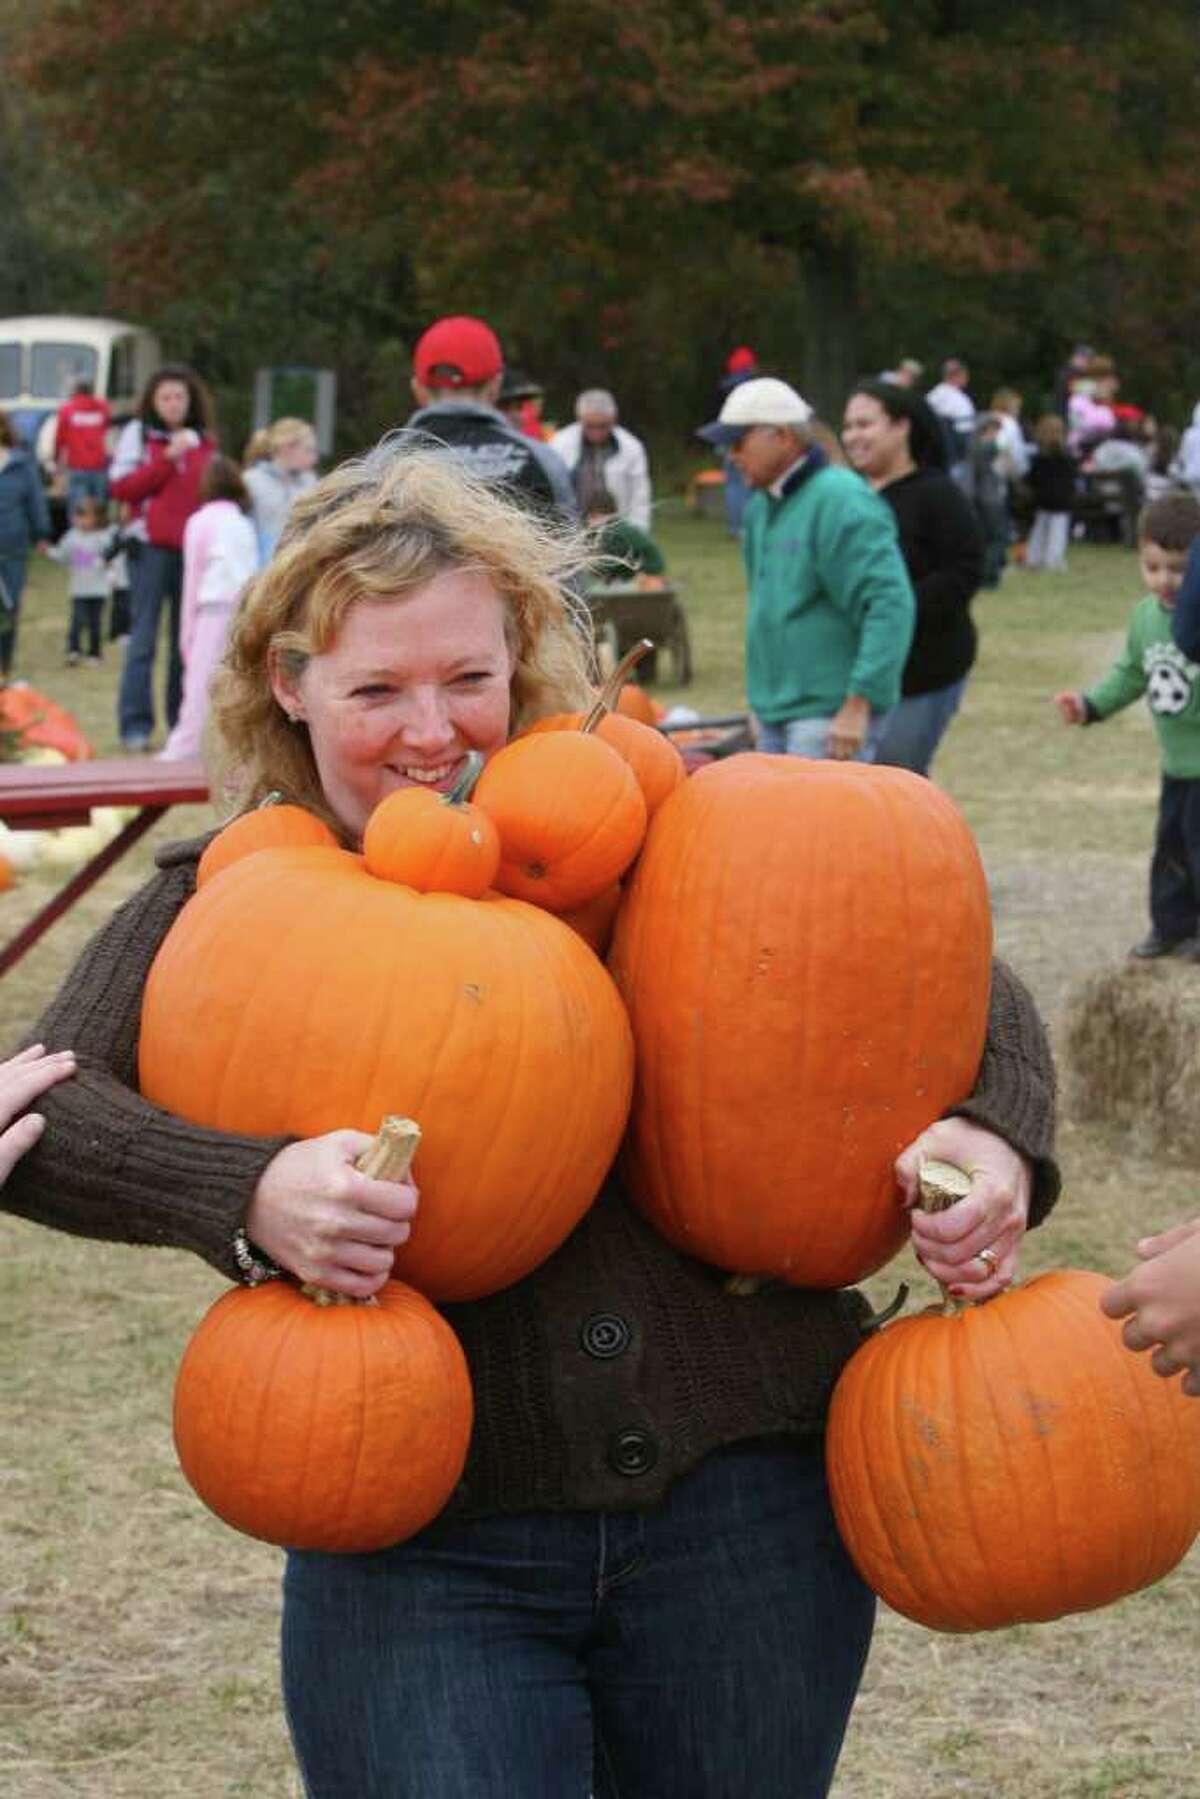 Nora Dorso, of Lindenhurst, NY, carries as many pumpkins as she can at the Jones Tree Farm UNICEF Family Festival on Sunday, October 24, 2010.